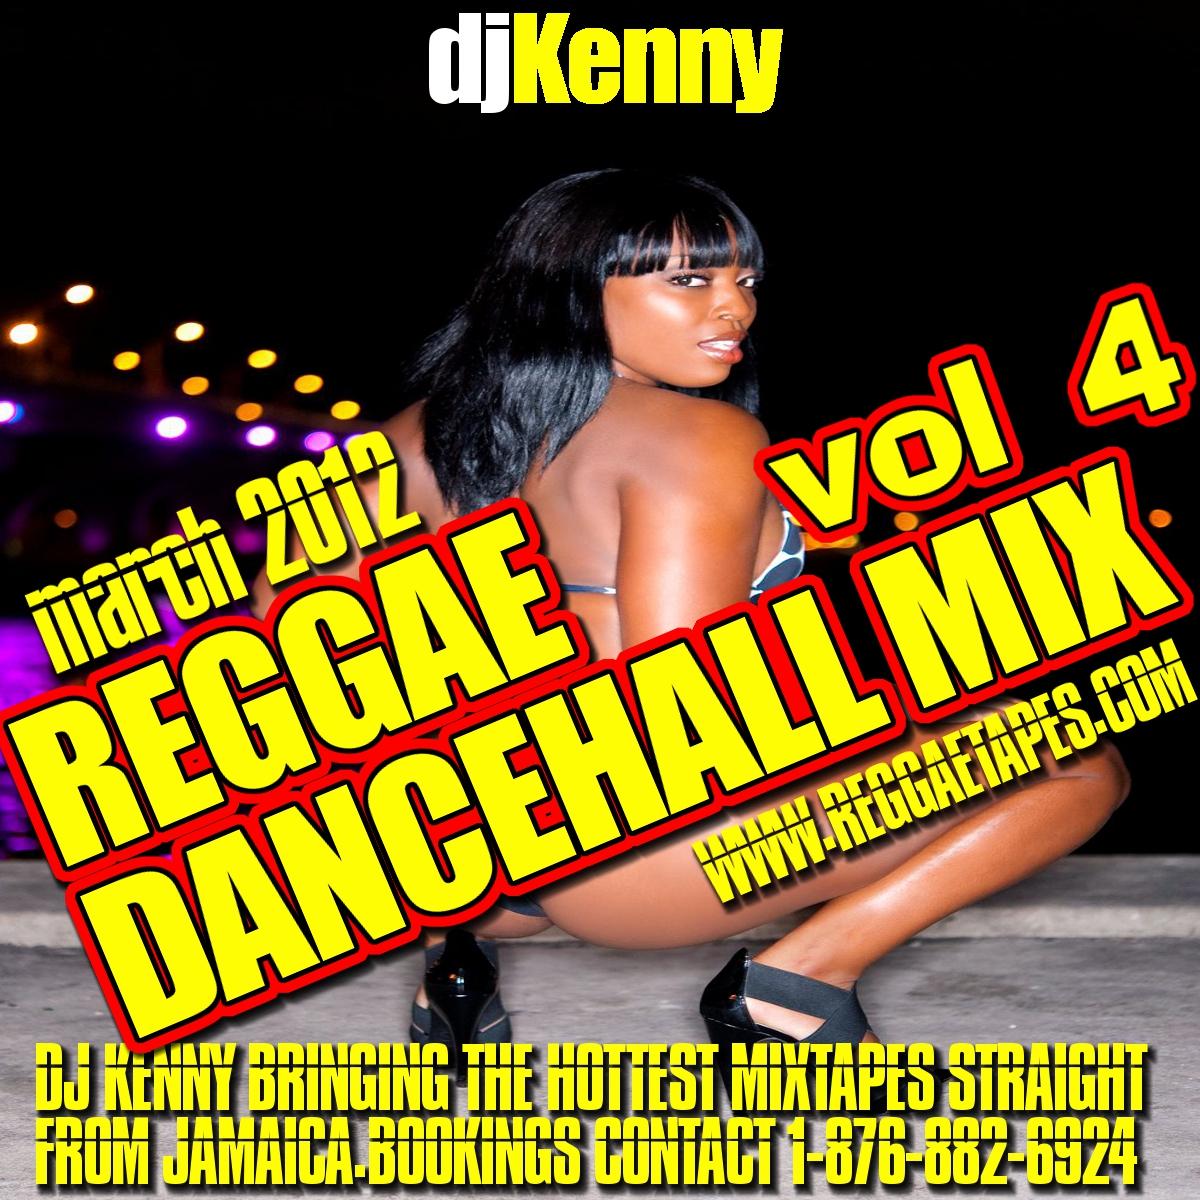 http://4.bp.blogspot.com/-rbUkW7bghZo/T1k_VH4x08I/AAAAAAAASHc/vFv6tkMASu4/s1600/DJ+KENNY+REGGAEDANCEHALLMIX+MARCH+2012.JPG